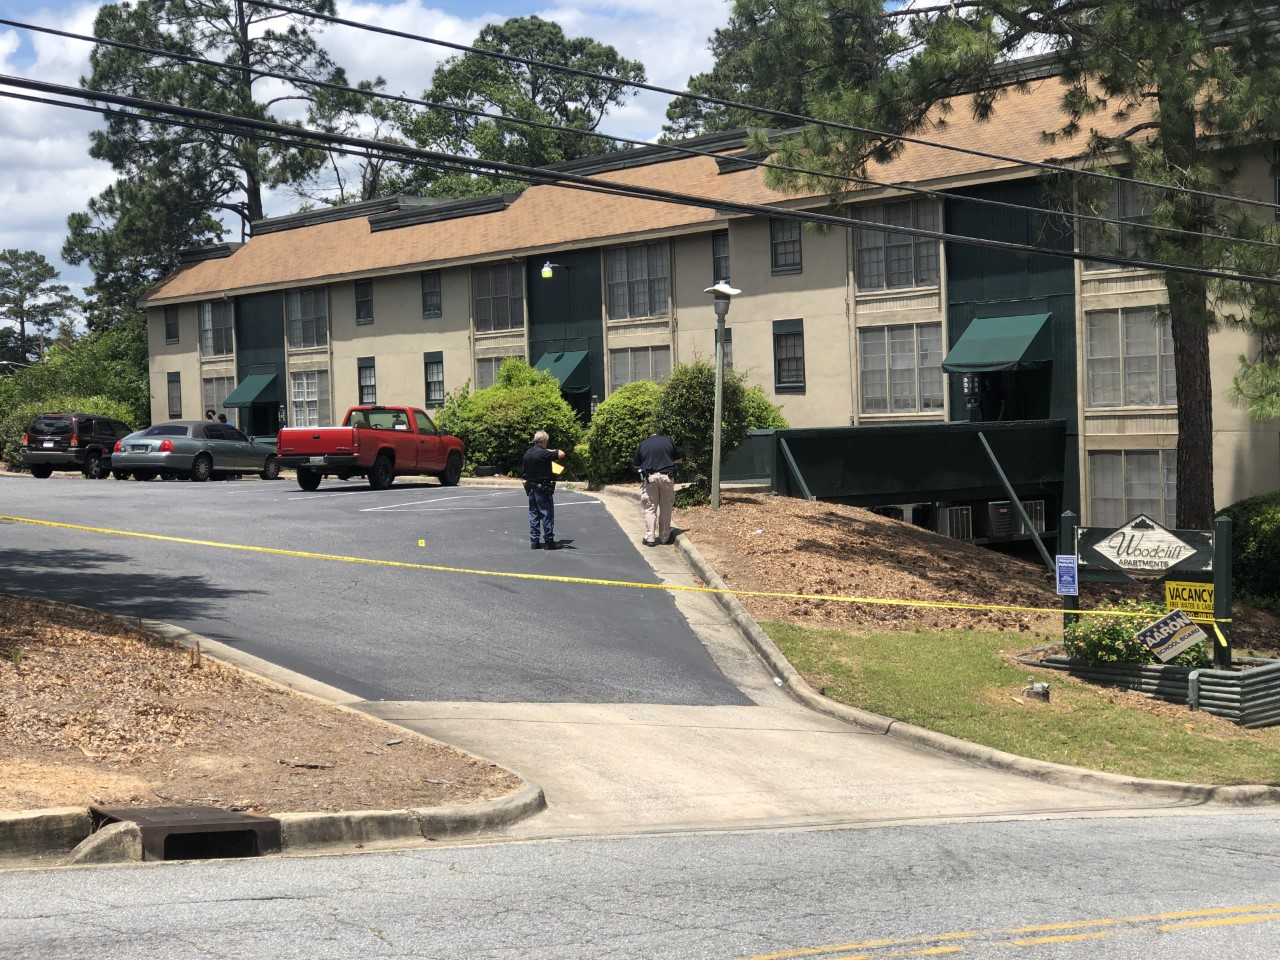 Woodcliff Apartments crime scene